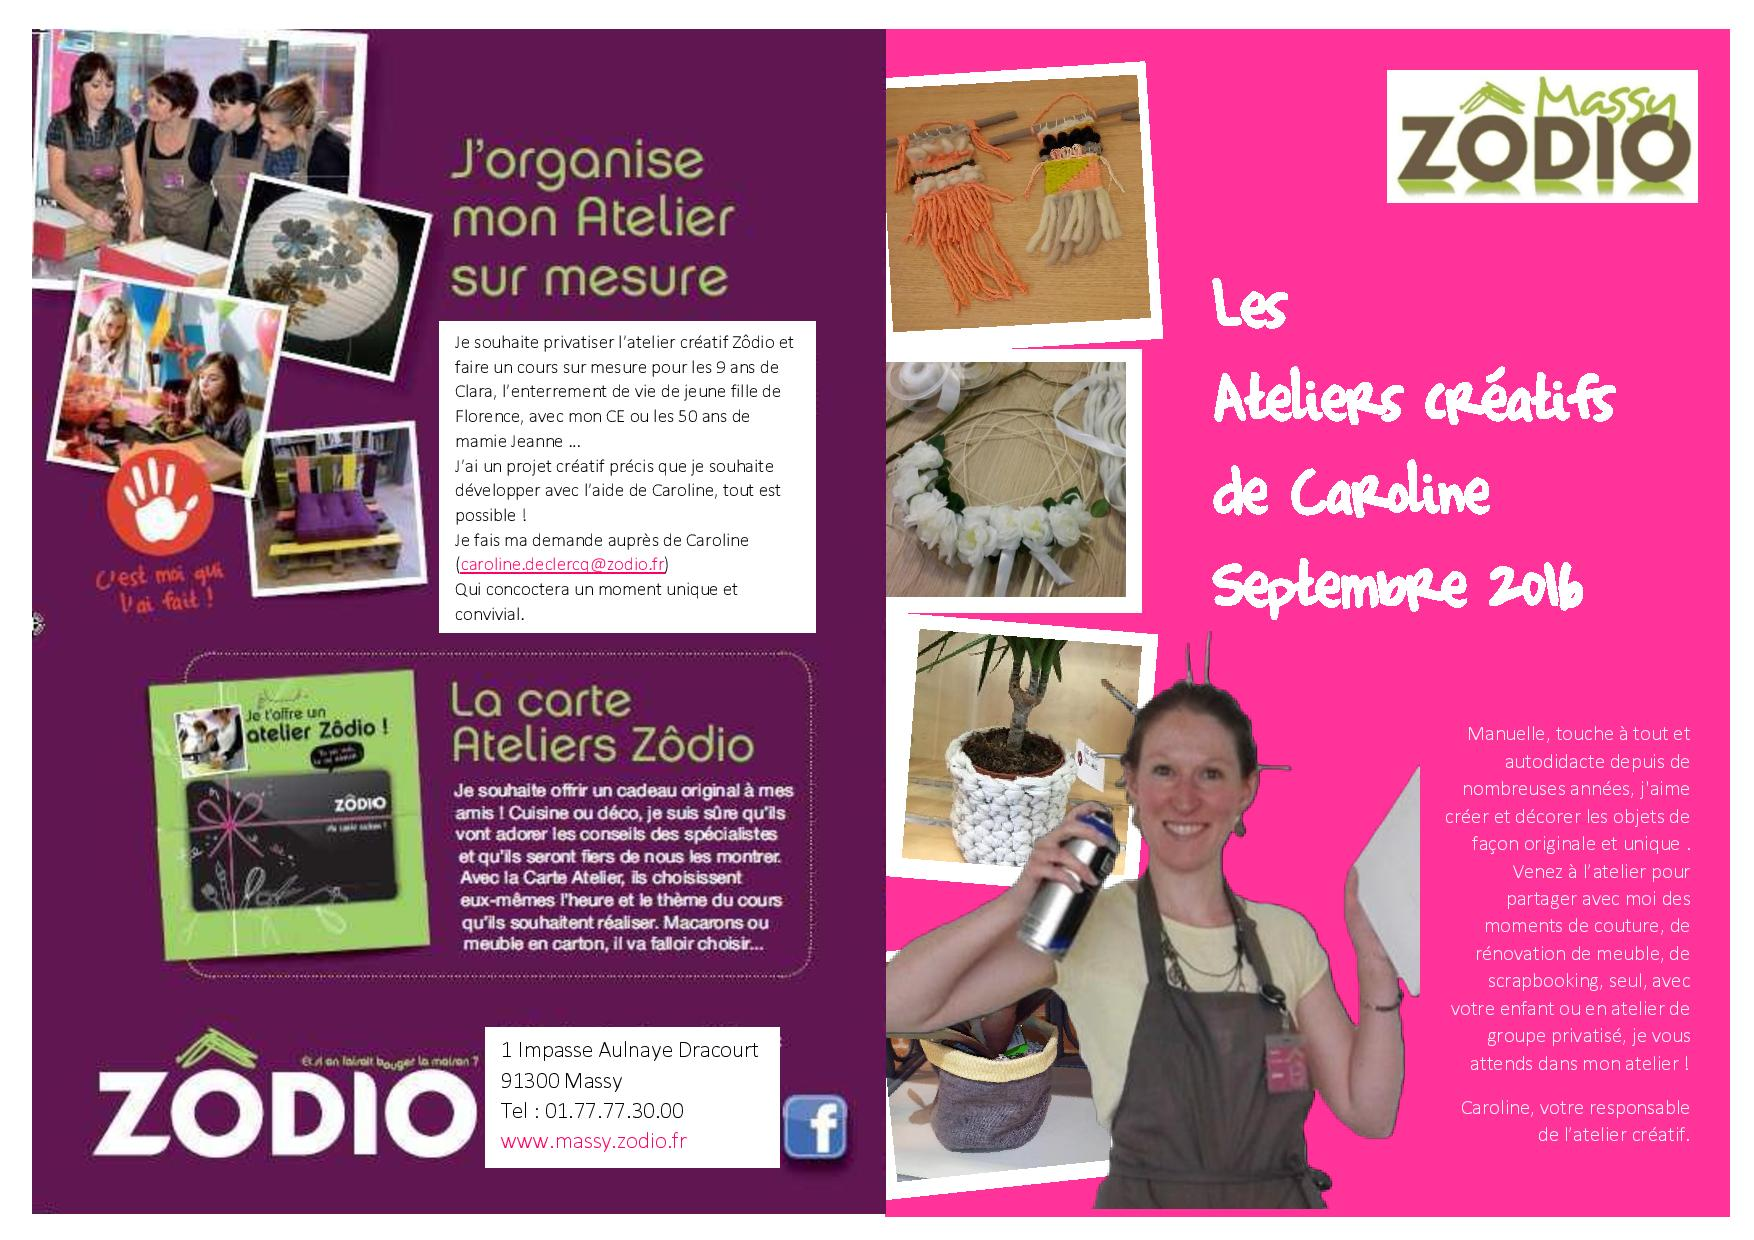 Planning atelier cr atif septembre 2016 zodio massy - Zodio chambourcy atelier cuisine ...